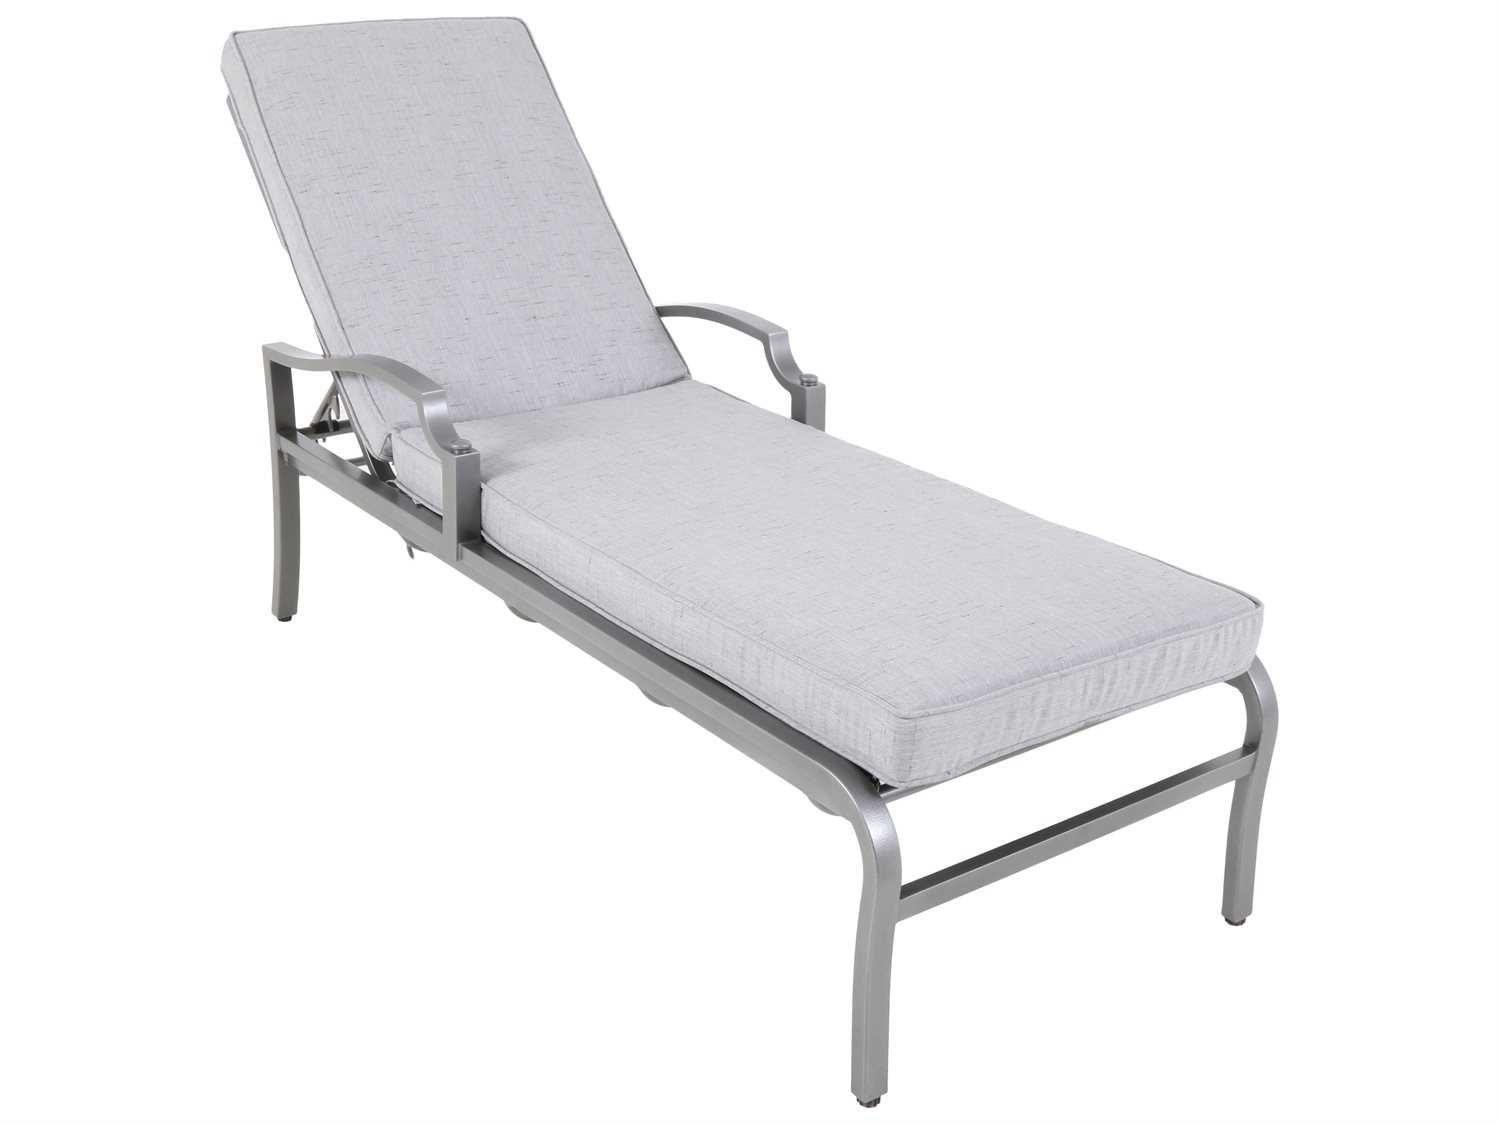 Sunvilla aragon cushion cast aluminum chaise lounge in for Cast aluminum chaise